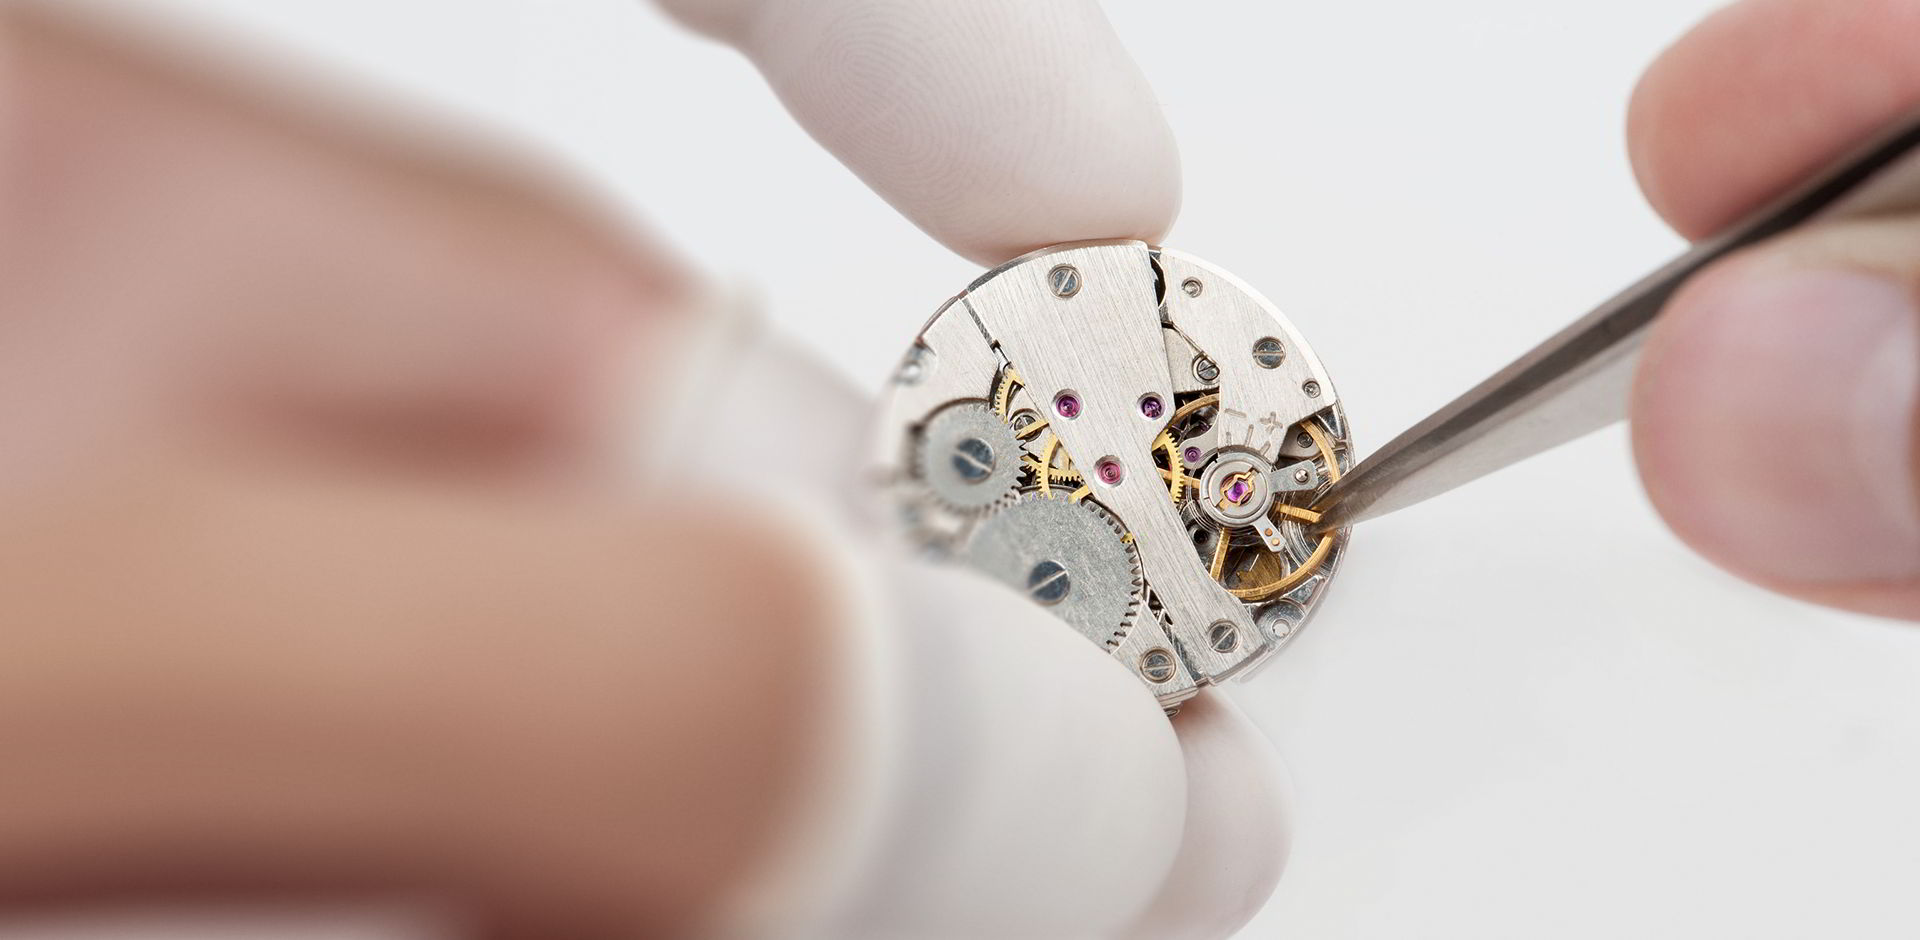 Horloger qui travaille méticuleusement